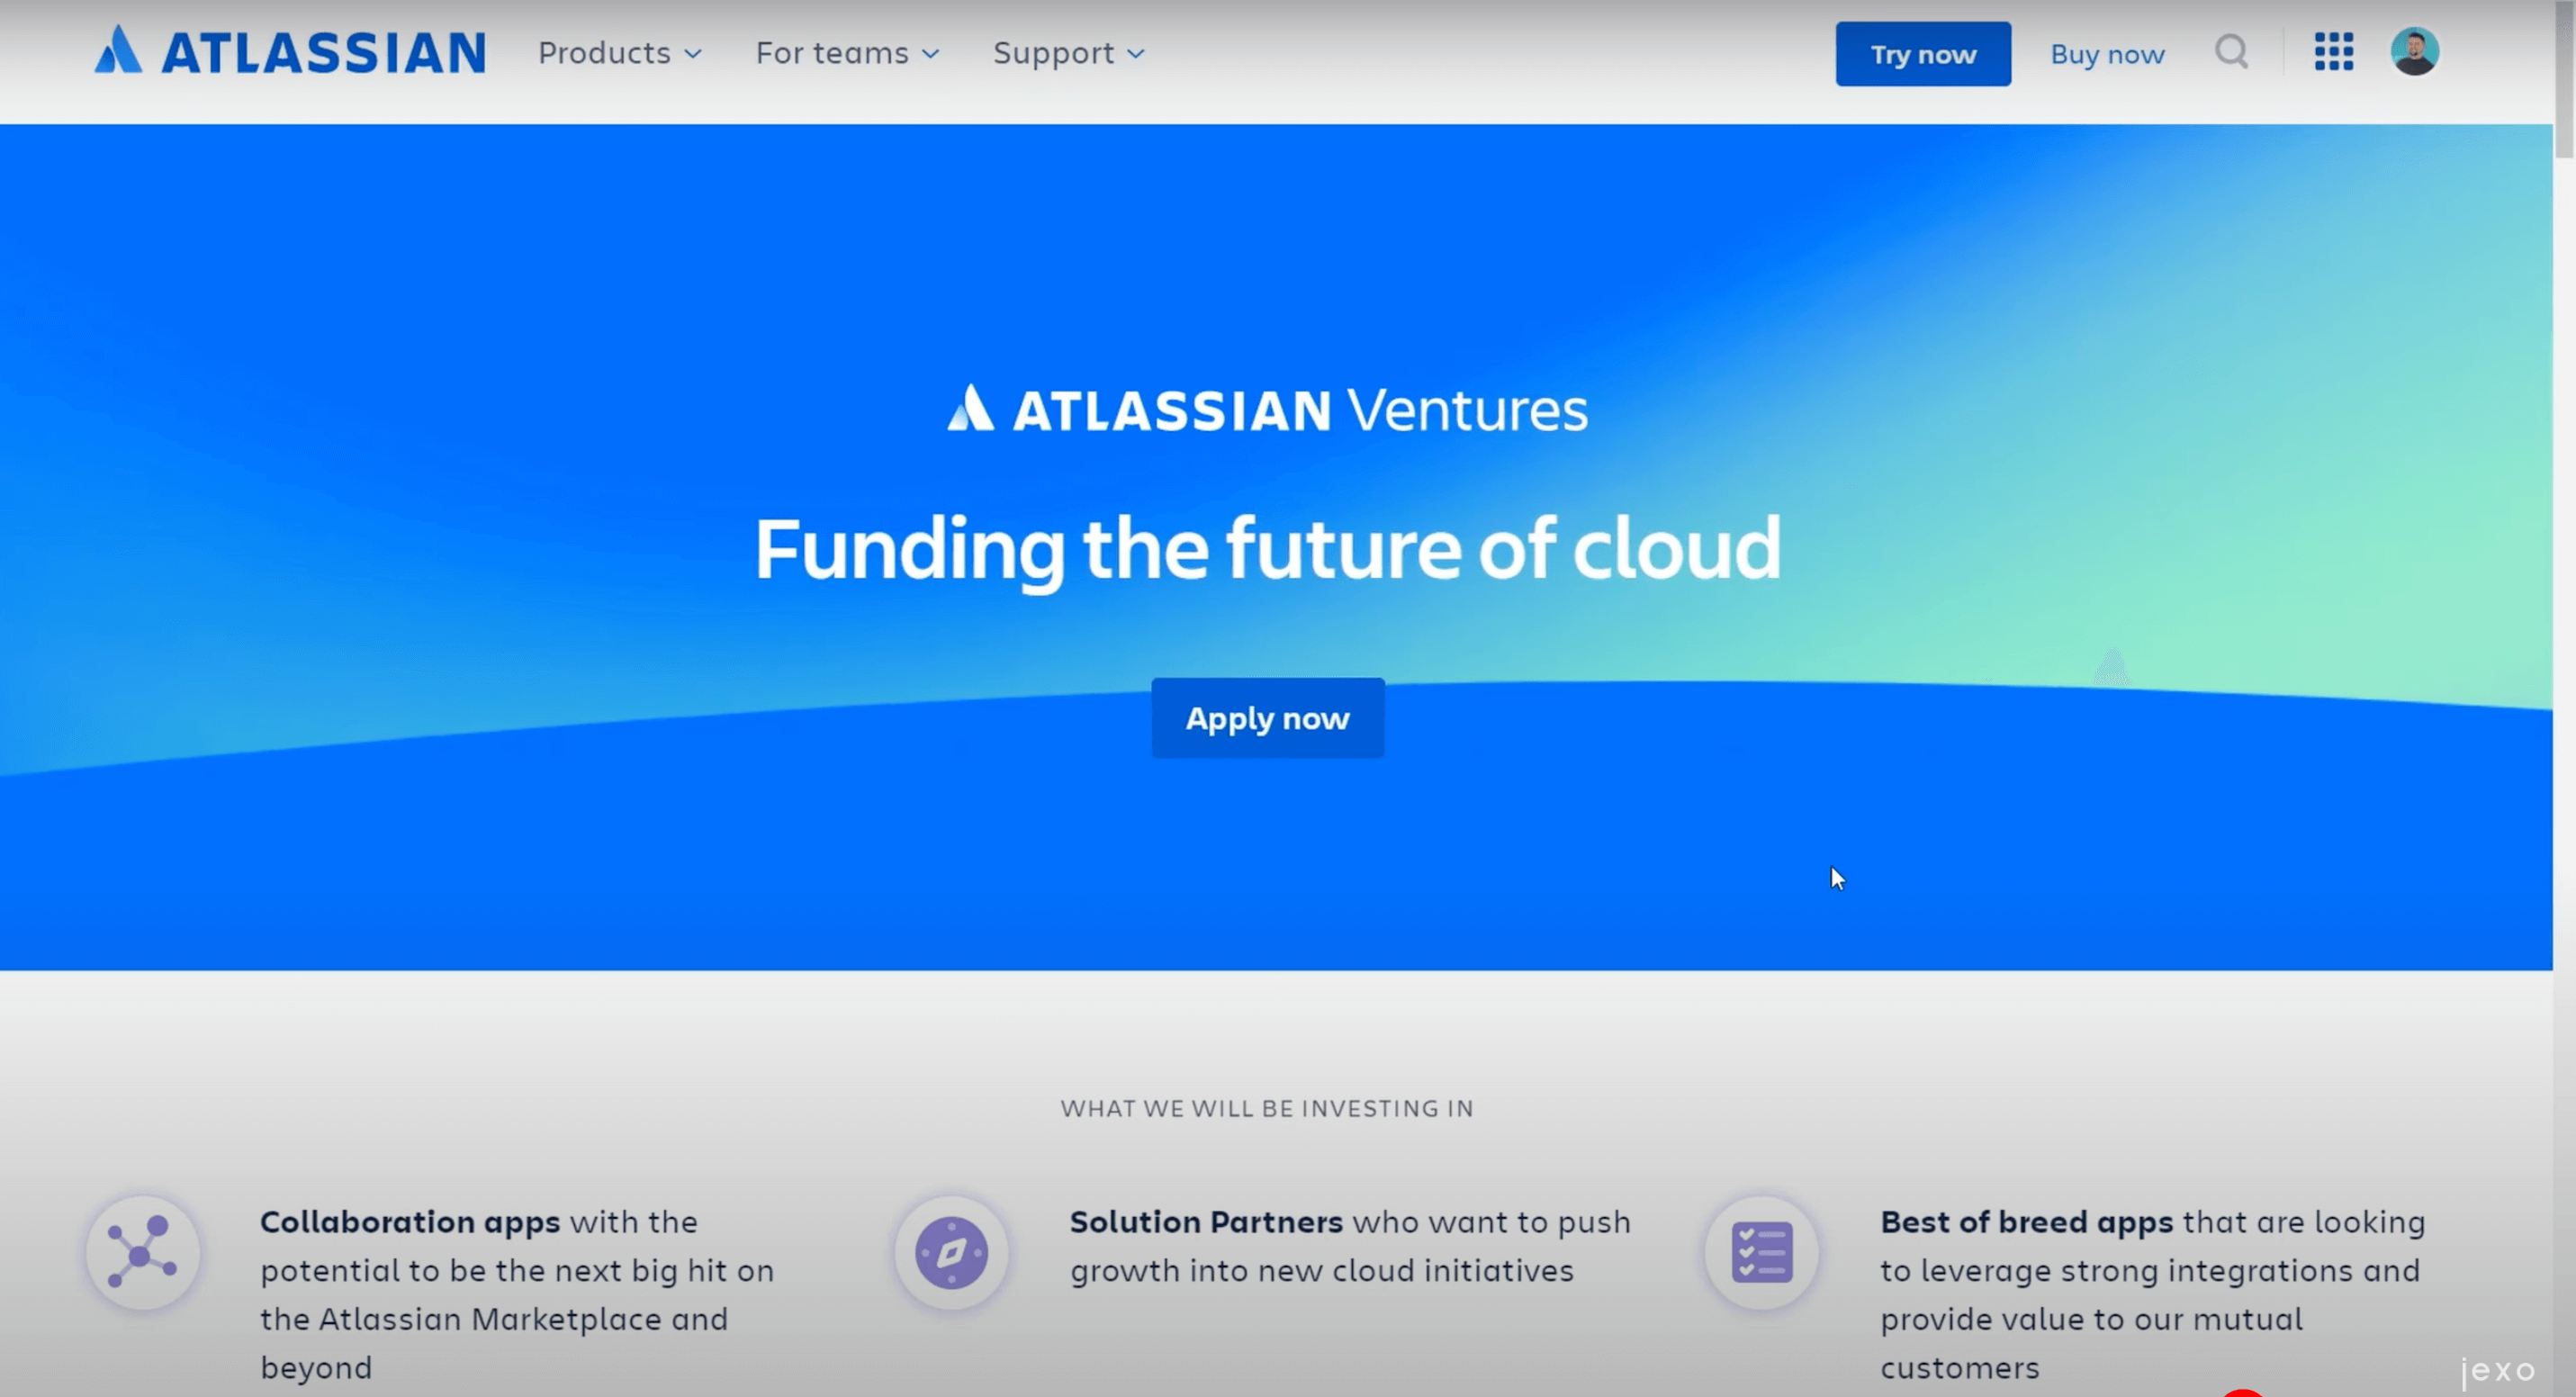 Atlassian ventures program can help you start on the digital marketplace